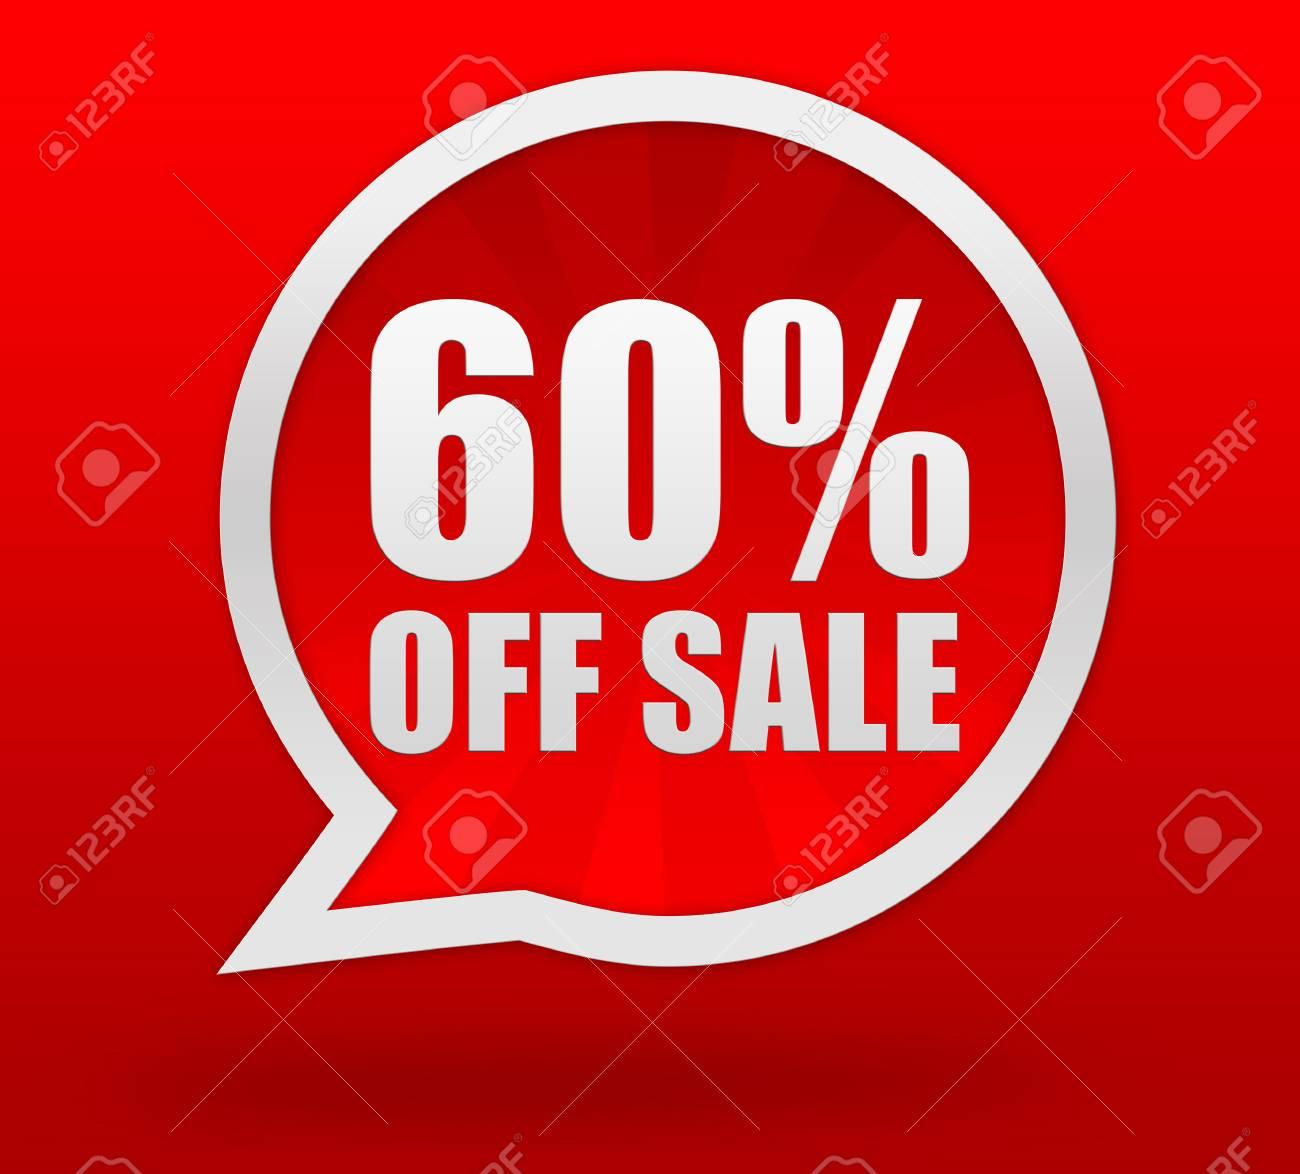 b997bca07 60% off sale badge 3d illustration isolated on background Stock  Illustration - 62849289